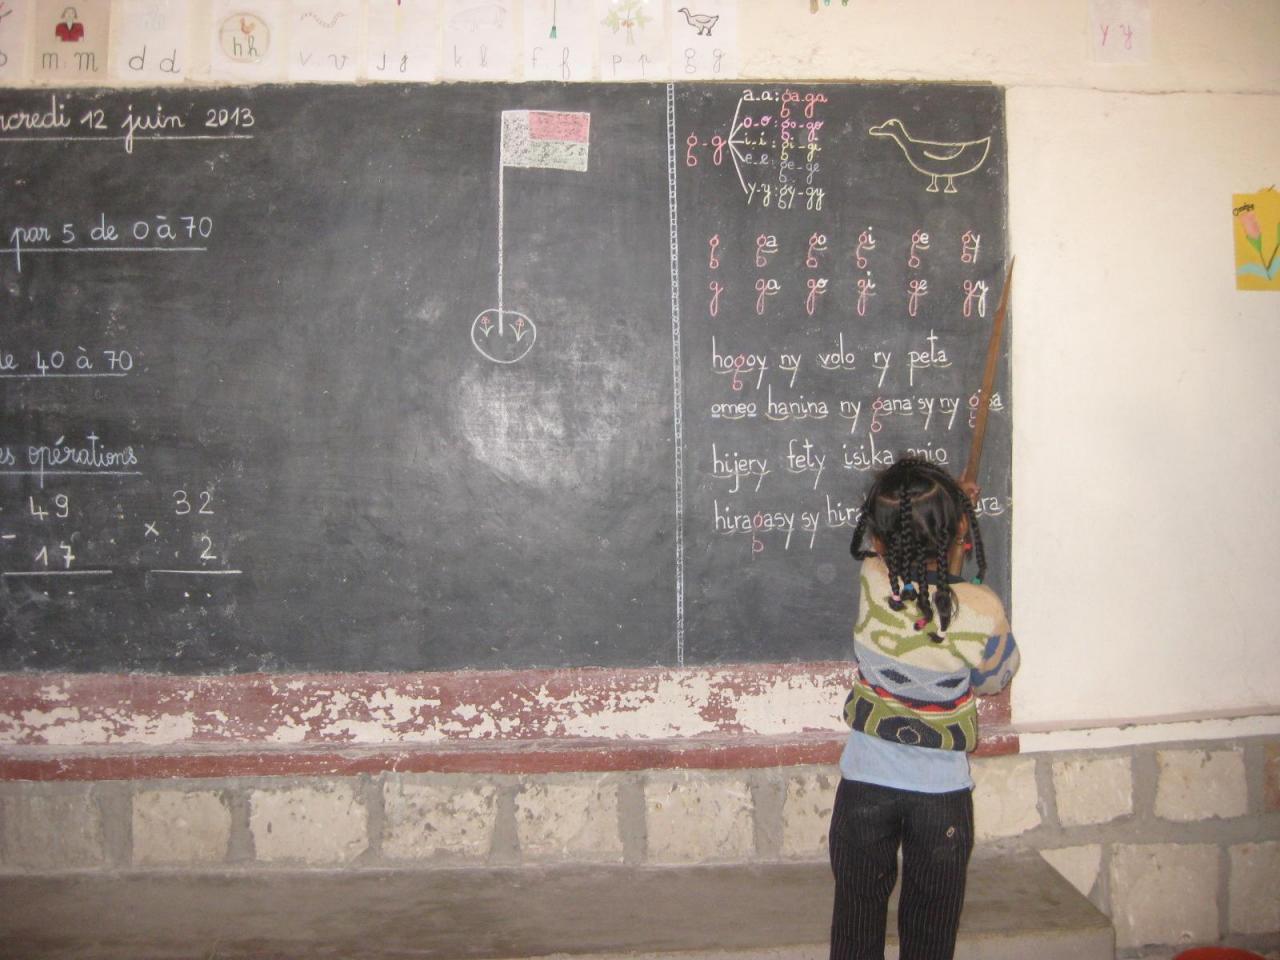 École de MIANDRIVAZO